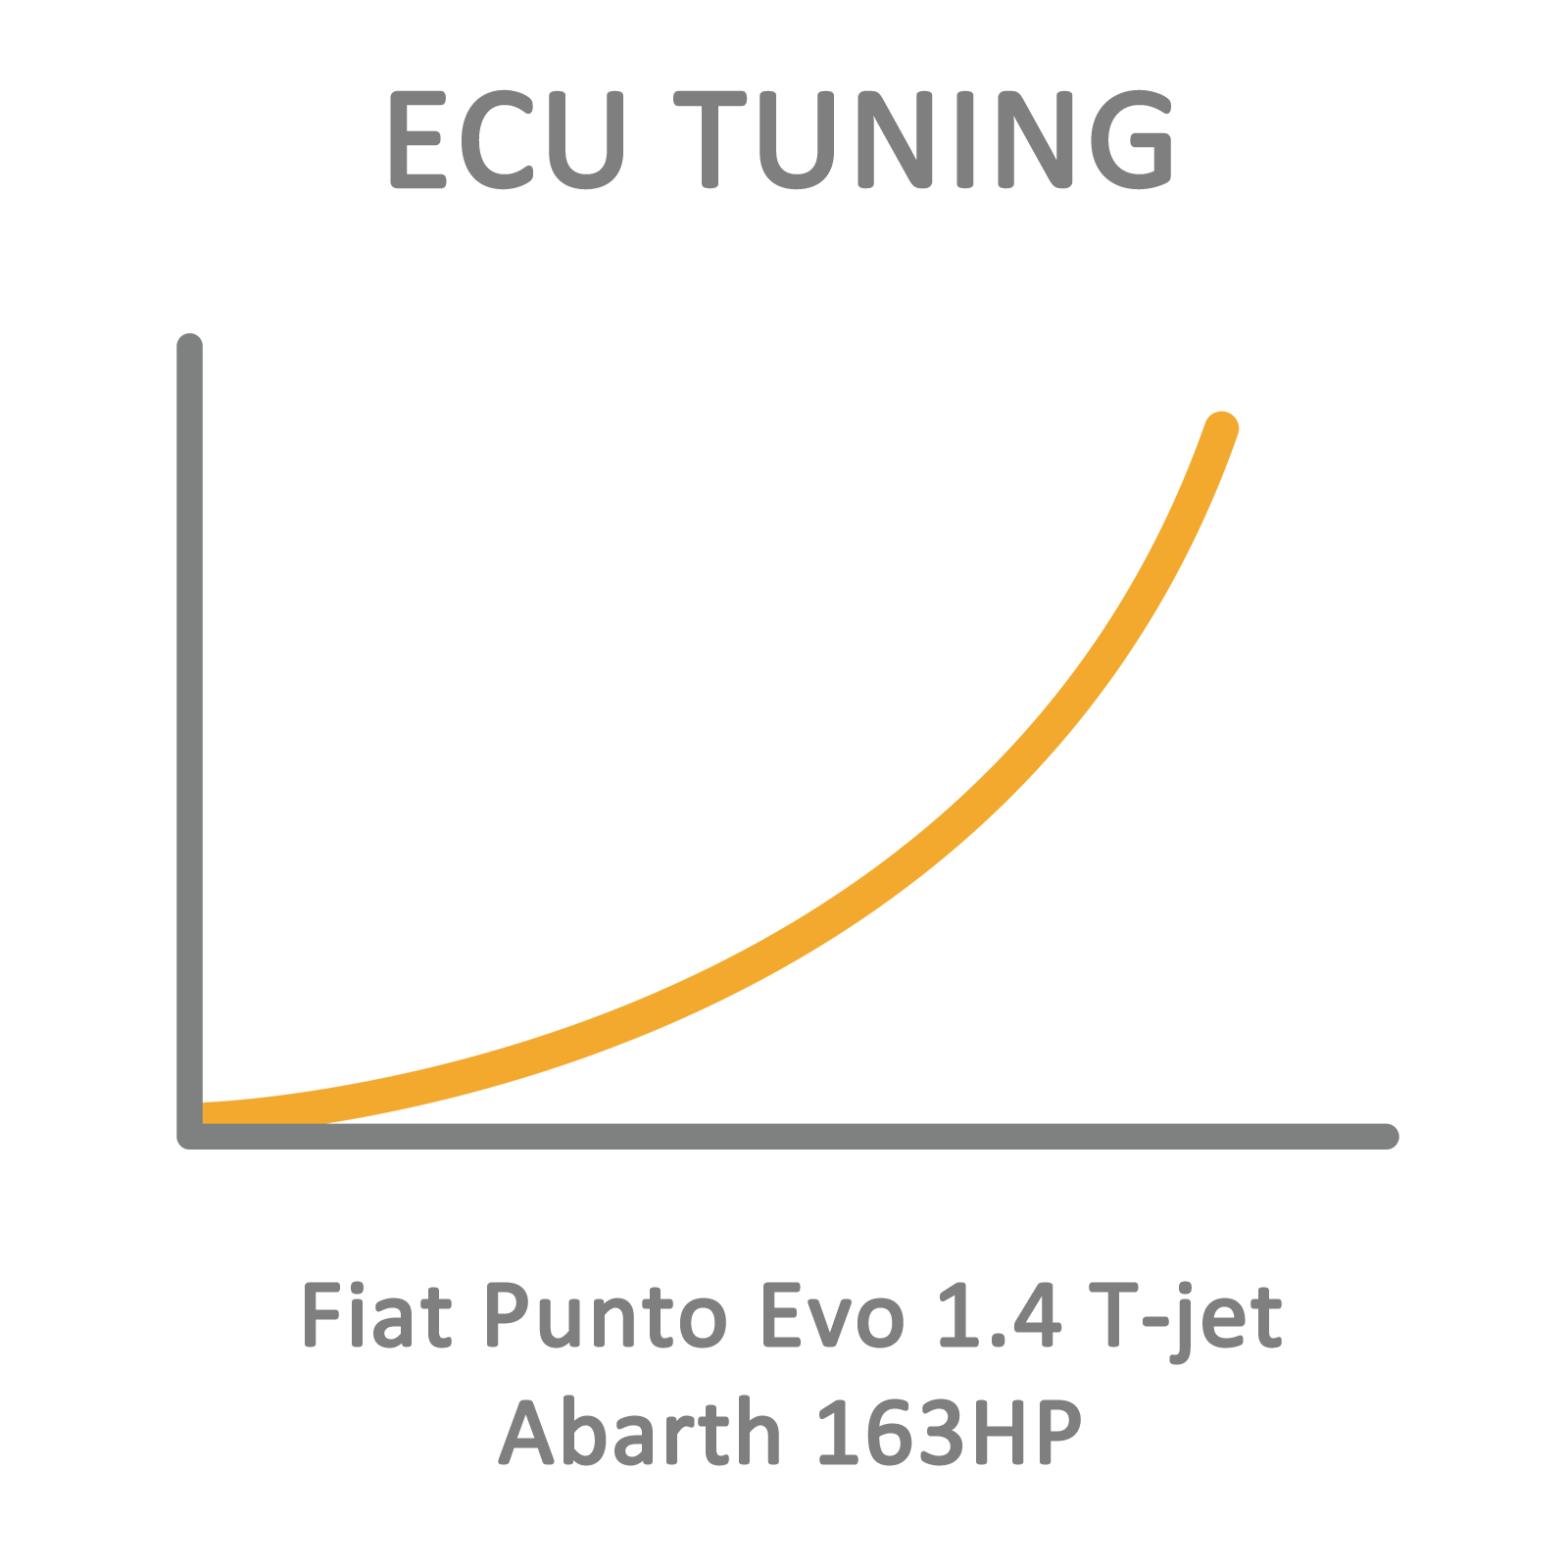 Fiat Punto Evo 1.4 T-jet Abarth 163HP ECU Tuning Remapping